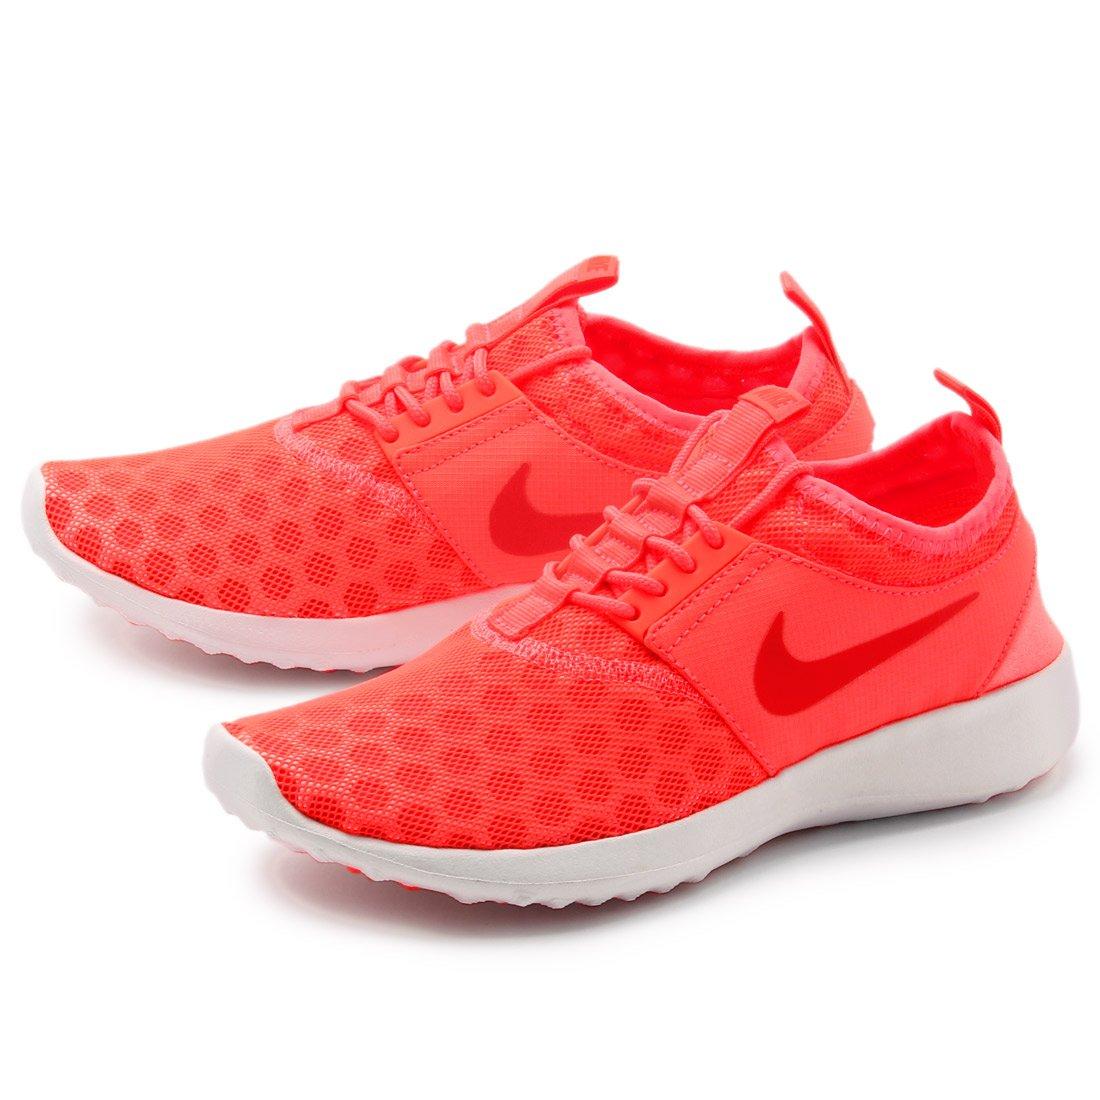 NIKE Women's Juvenate Running Shoe B00UZ7O84C 6 B(M) US|Hot Lava/Bright Crimson/White